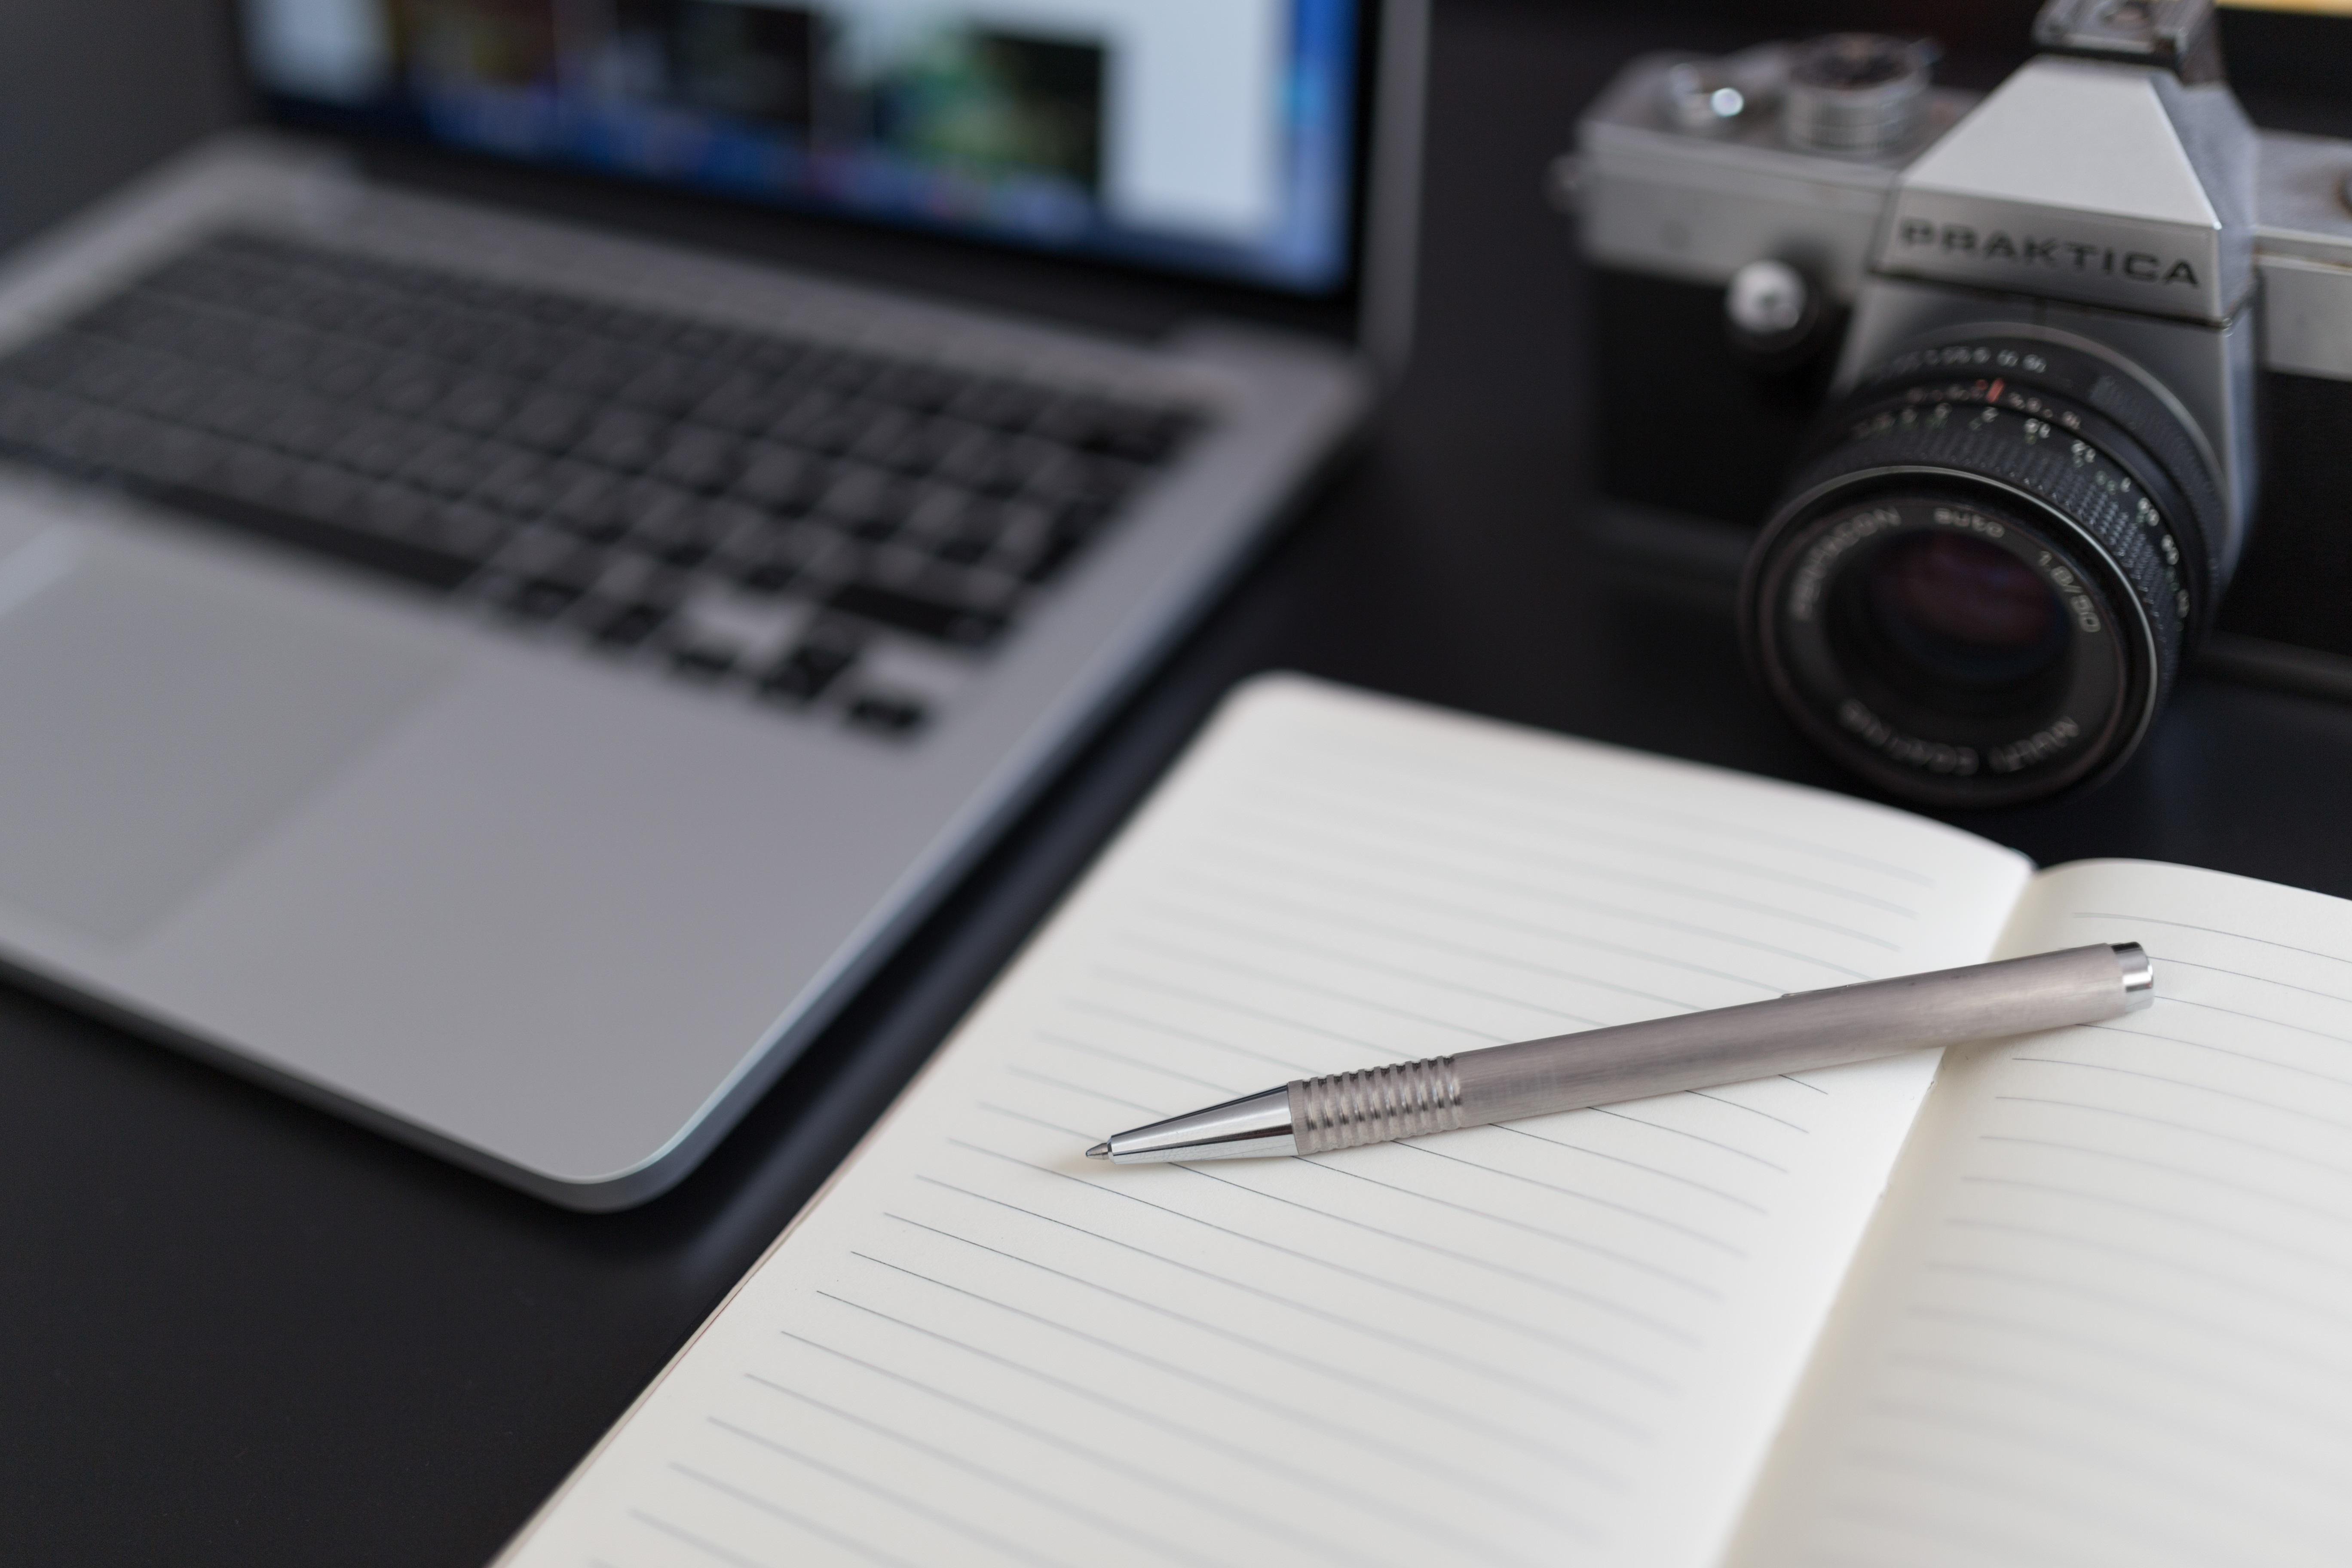 Laptop desk notebook computer macbook writing 698649 pxhere.com